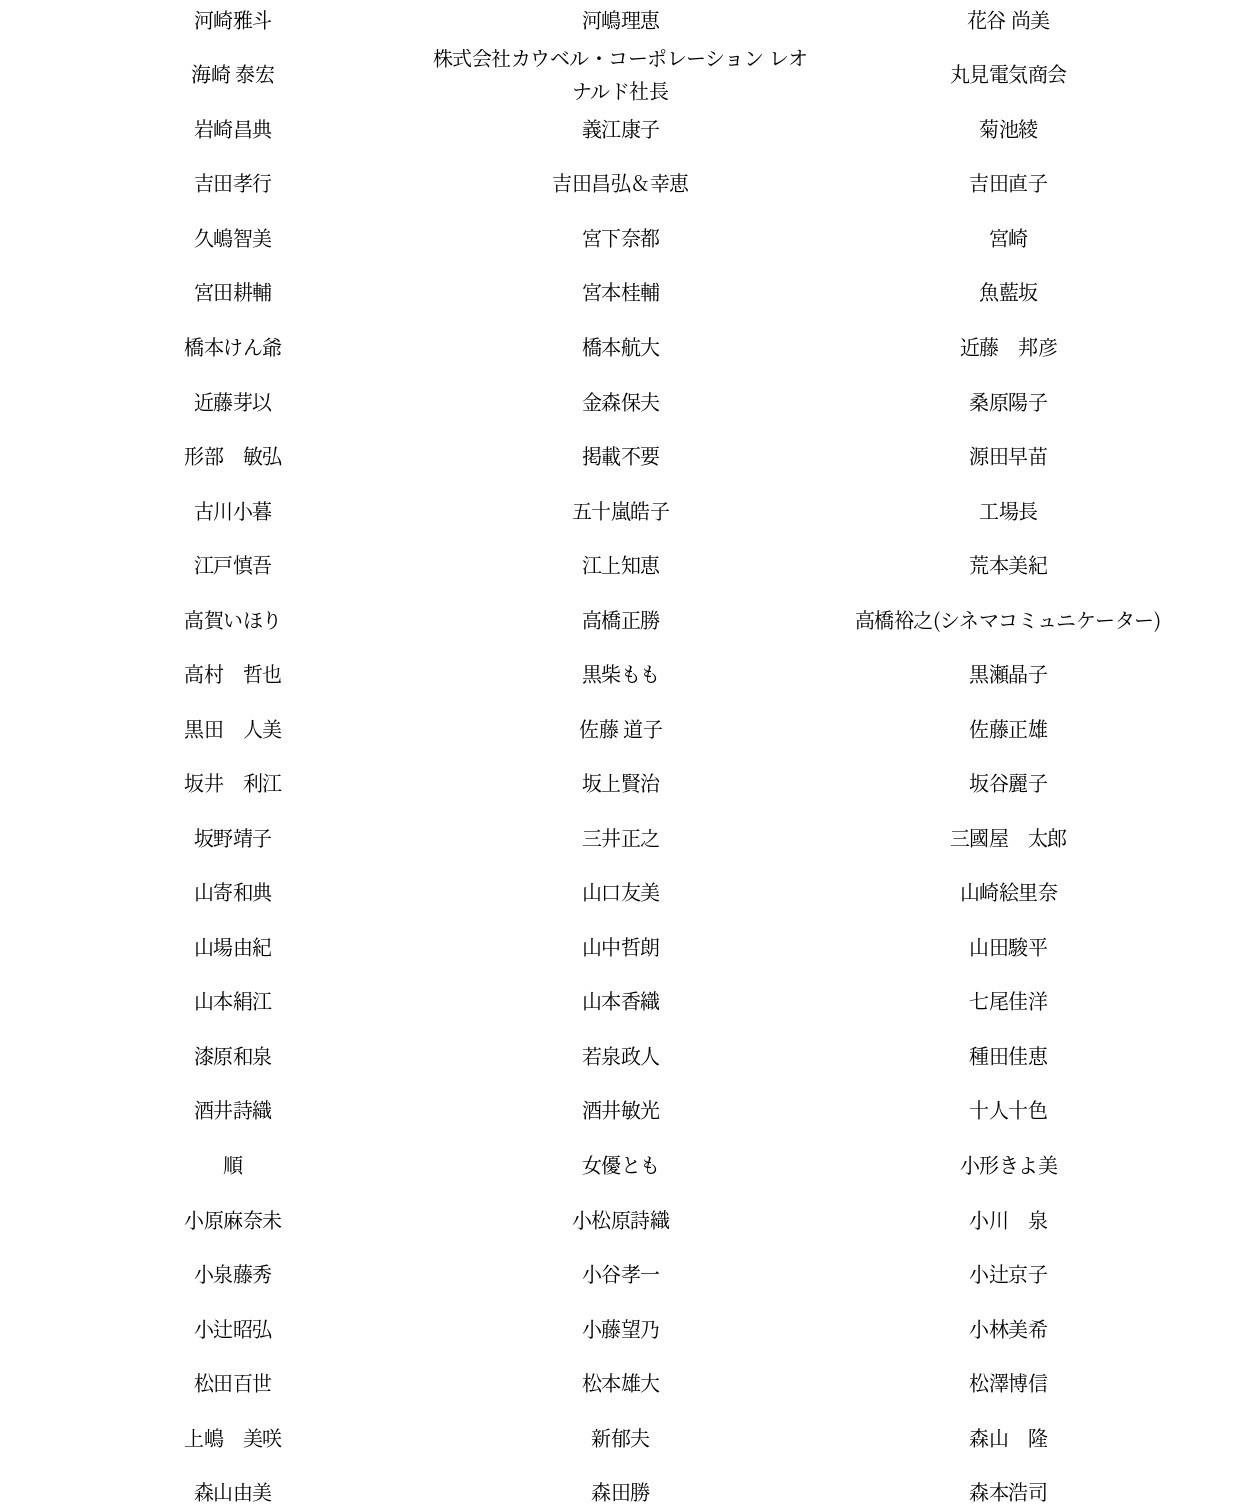 cf-0417-p4.jpg